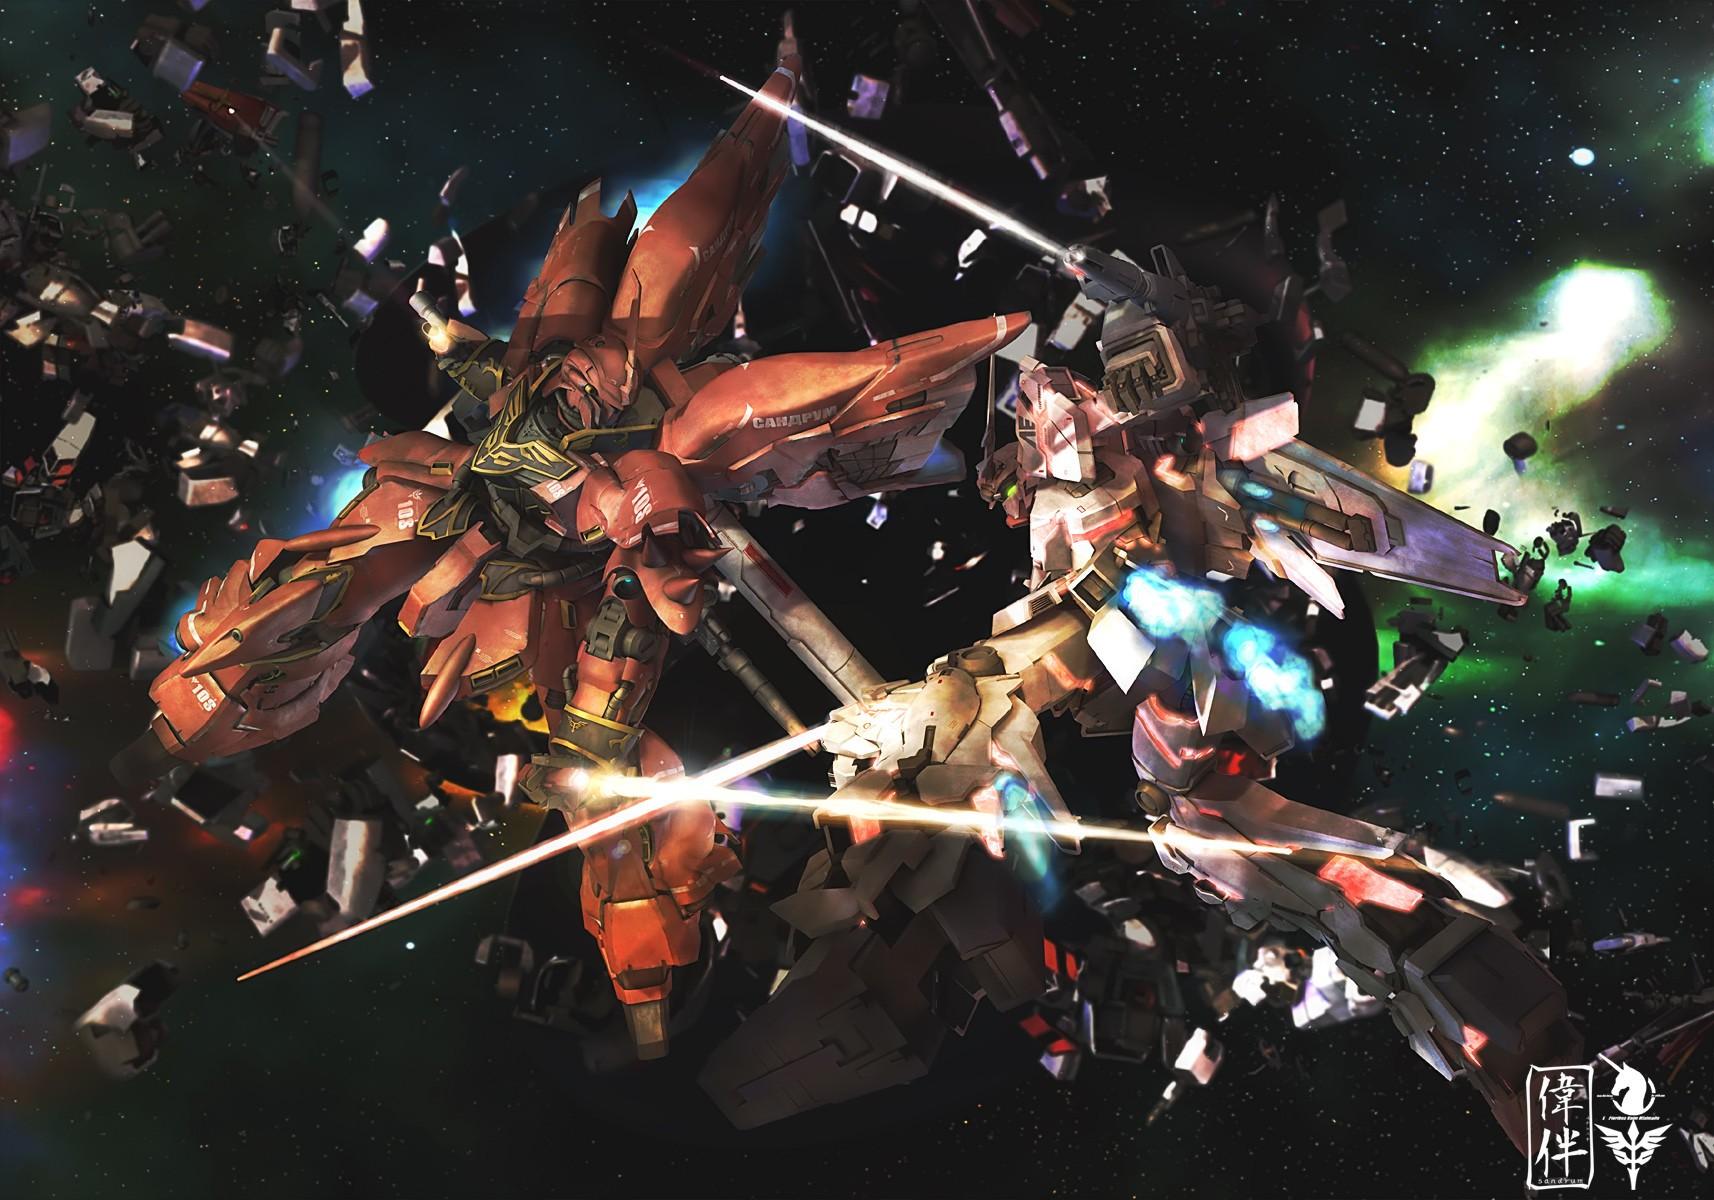 Wallpaper Anime Mobile Suit Gundam Unicorn Mobile Suit Screenshot Concert 1714x1200 Wwwyzzerdd 246530 Hd Wallpapers Wallhere